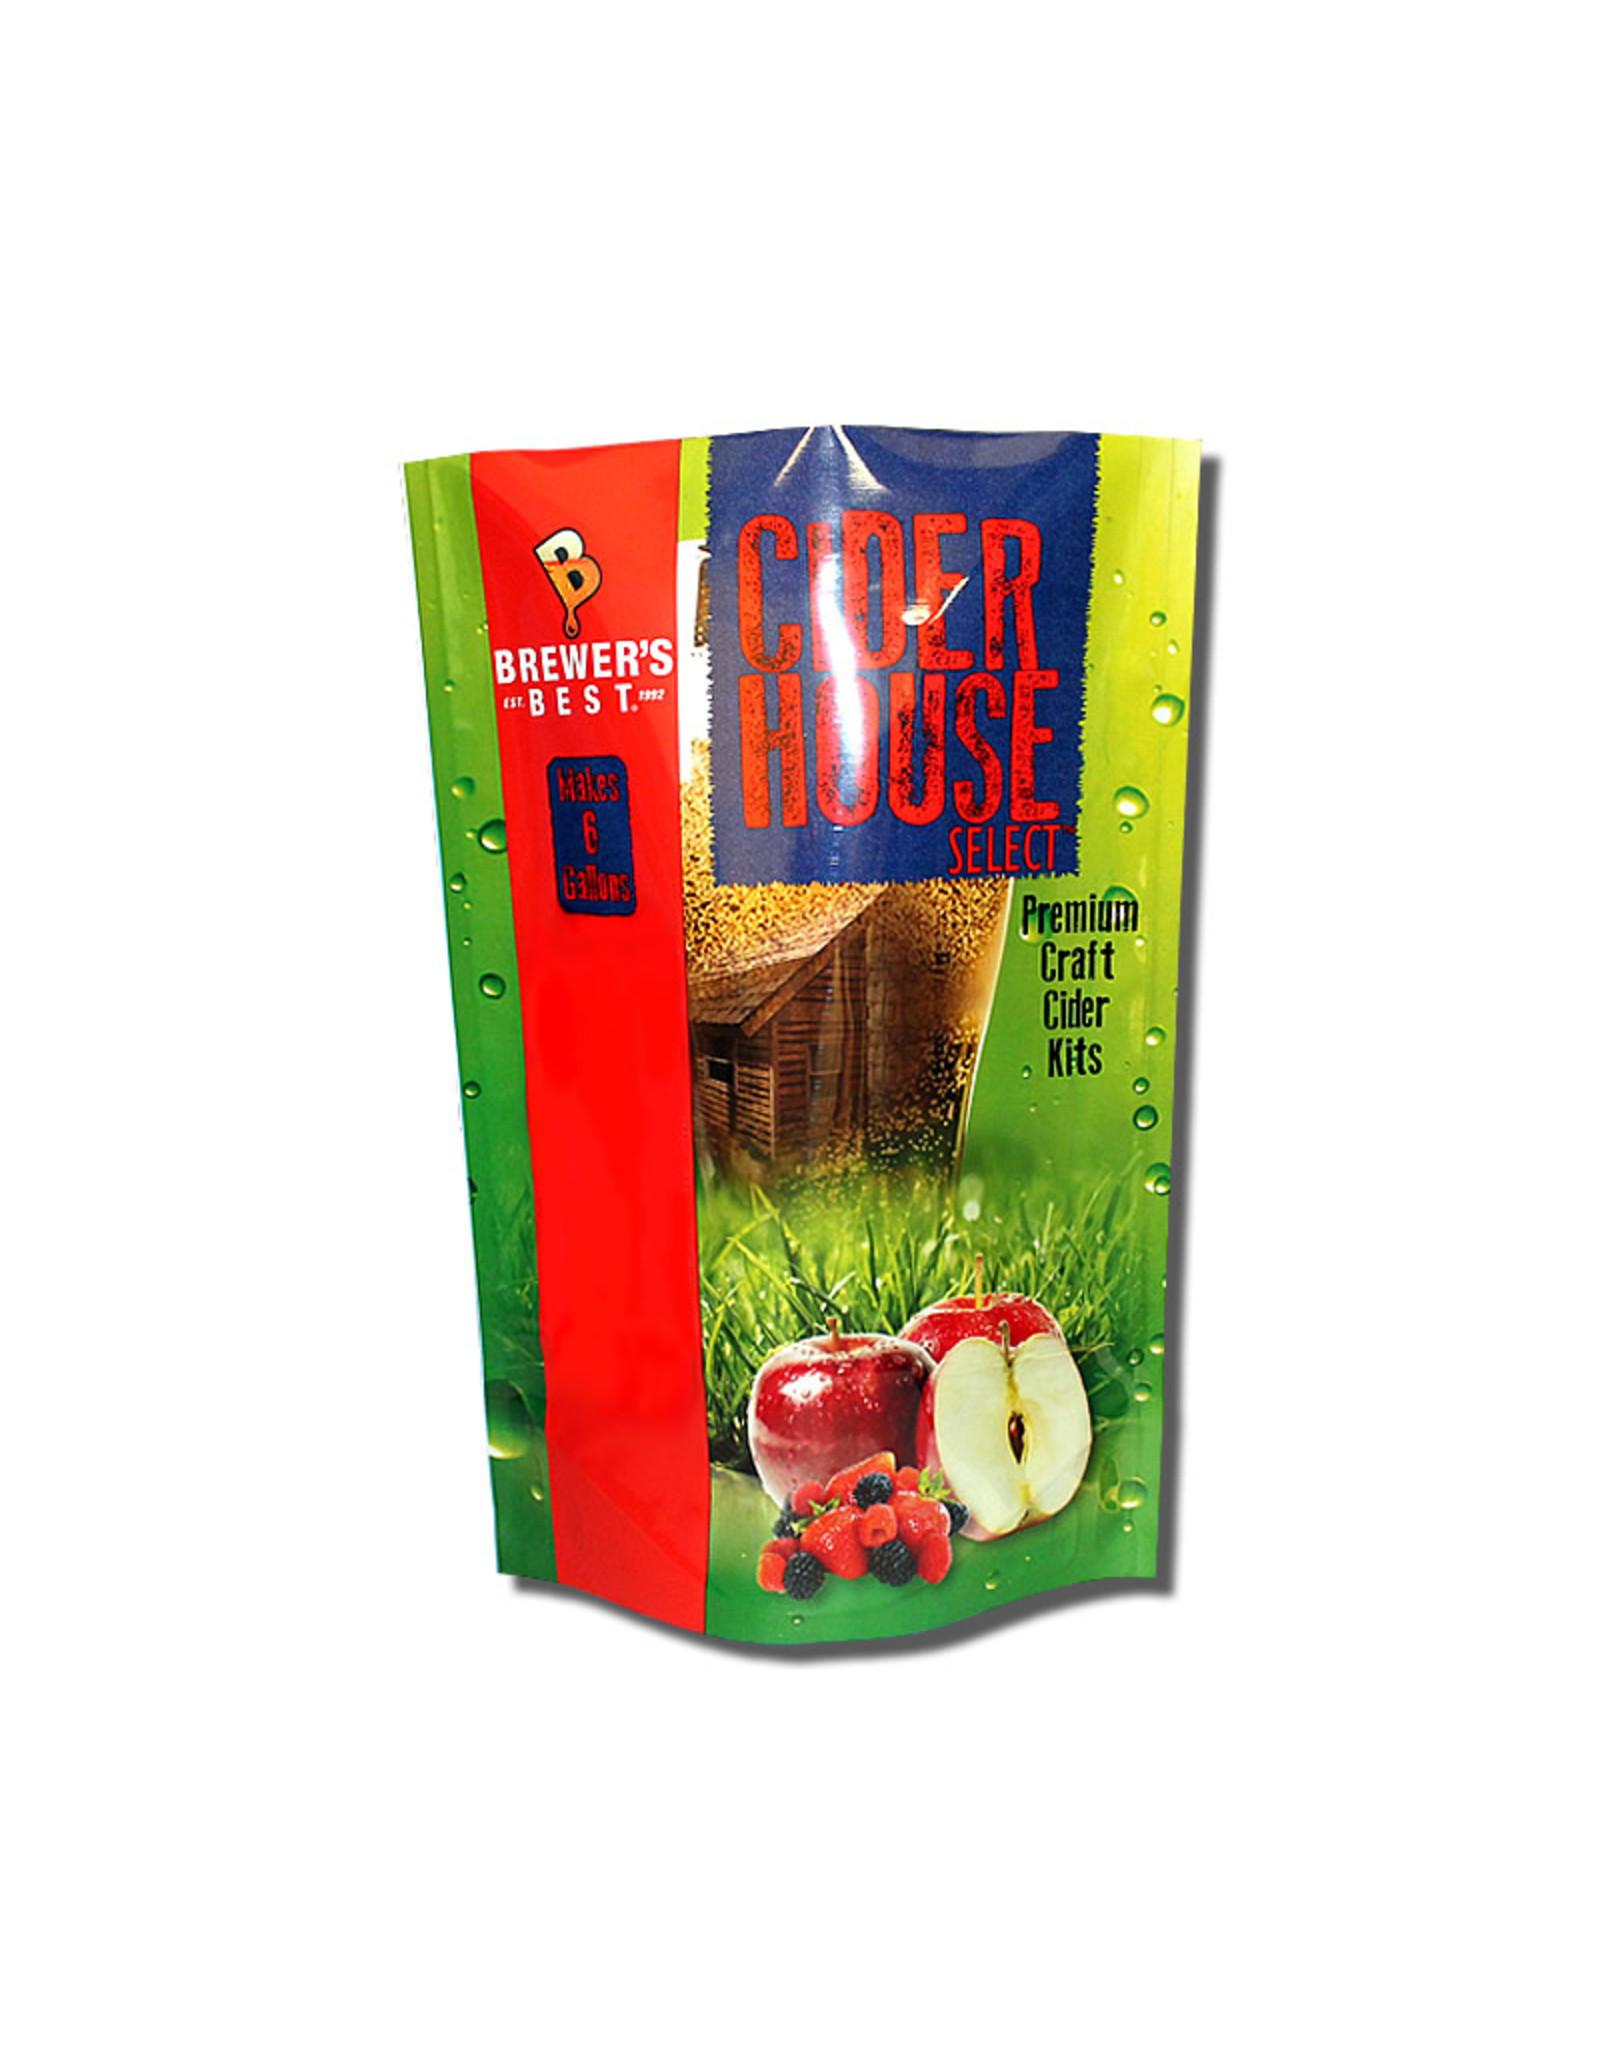 Cider House Select - Pear Cider